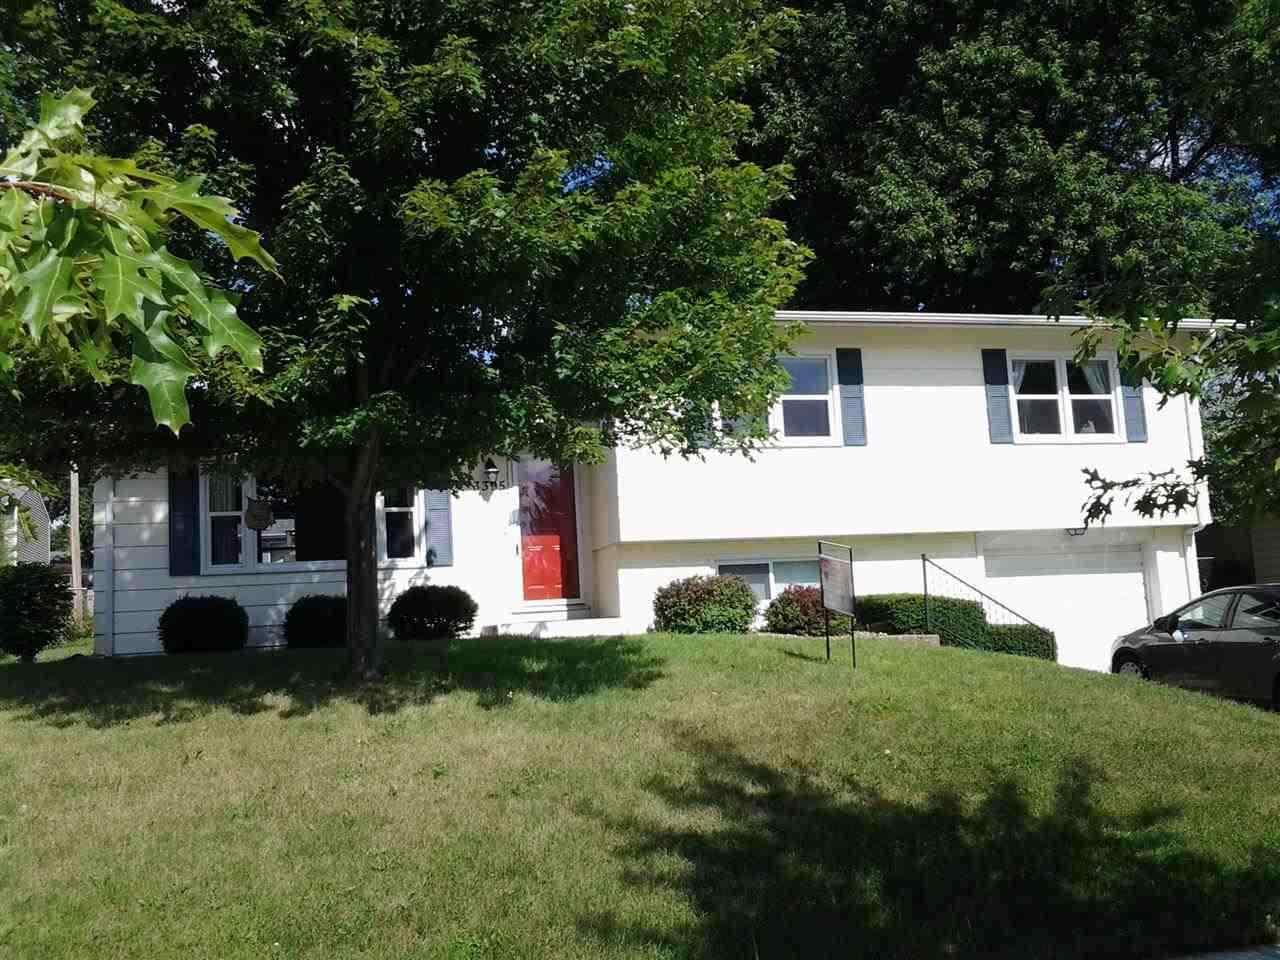 Rental Homes for Rent, ListingId:31100377, location: 3395 29TH ST Bettendorf 52722